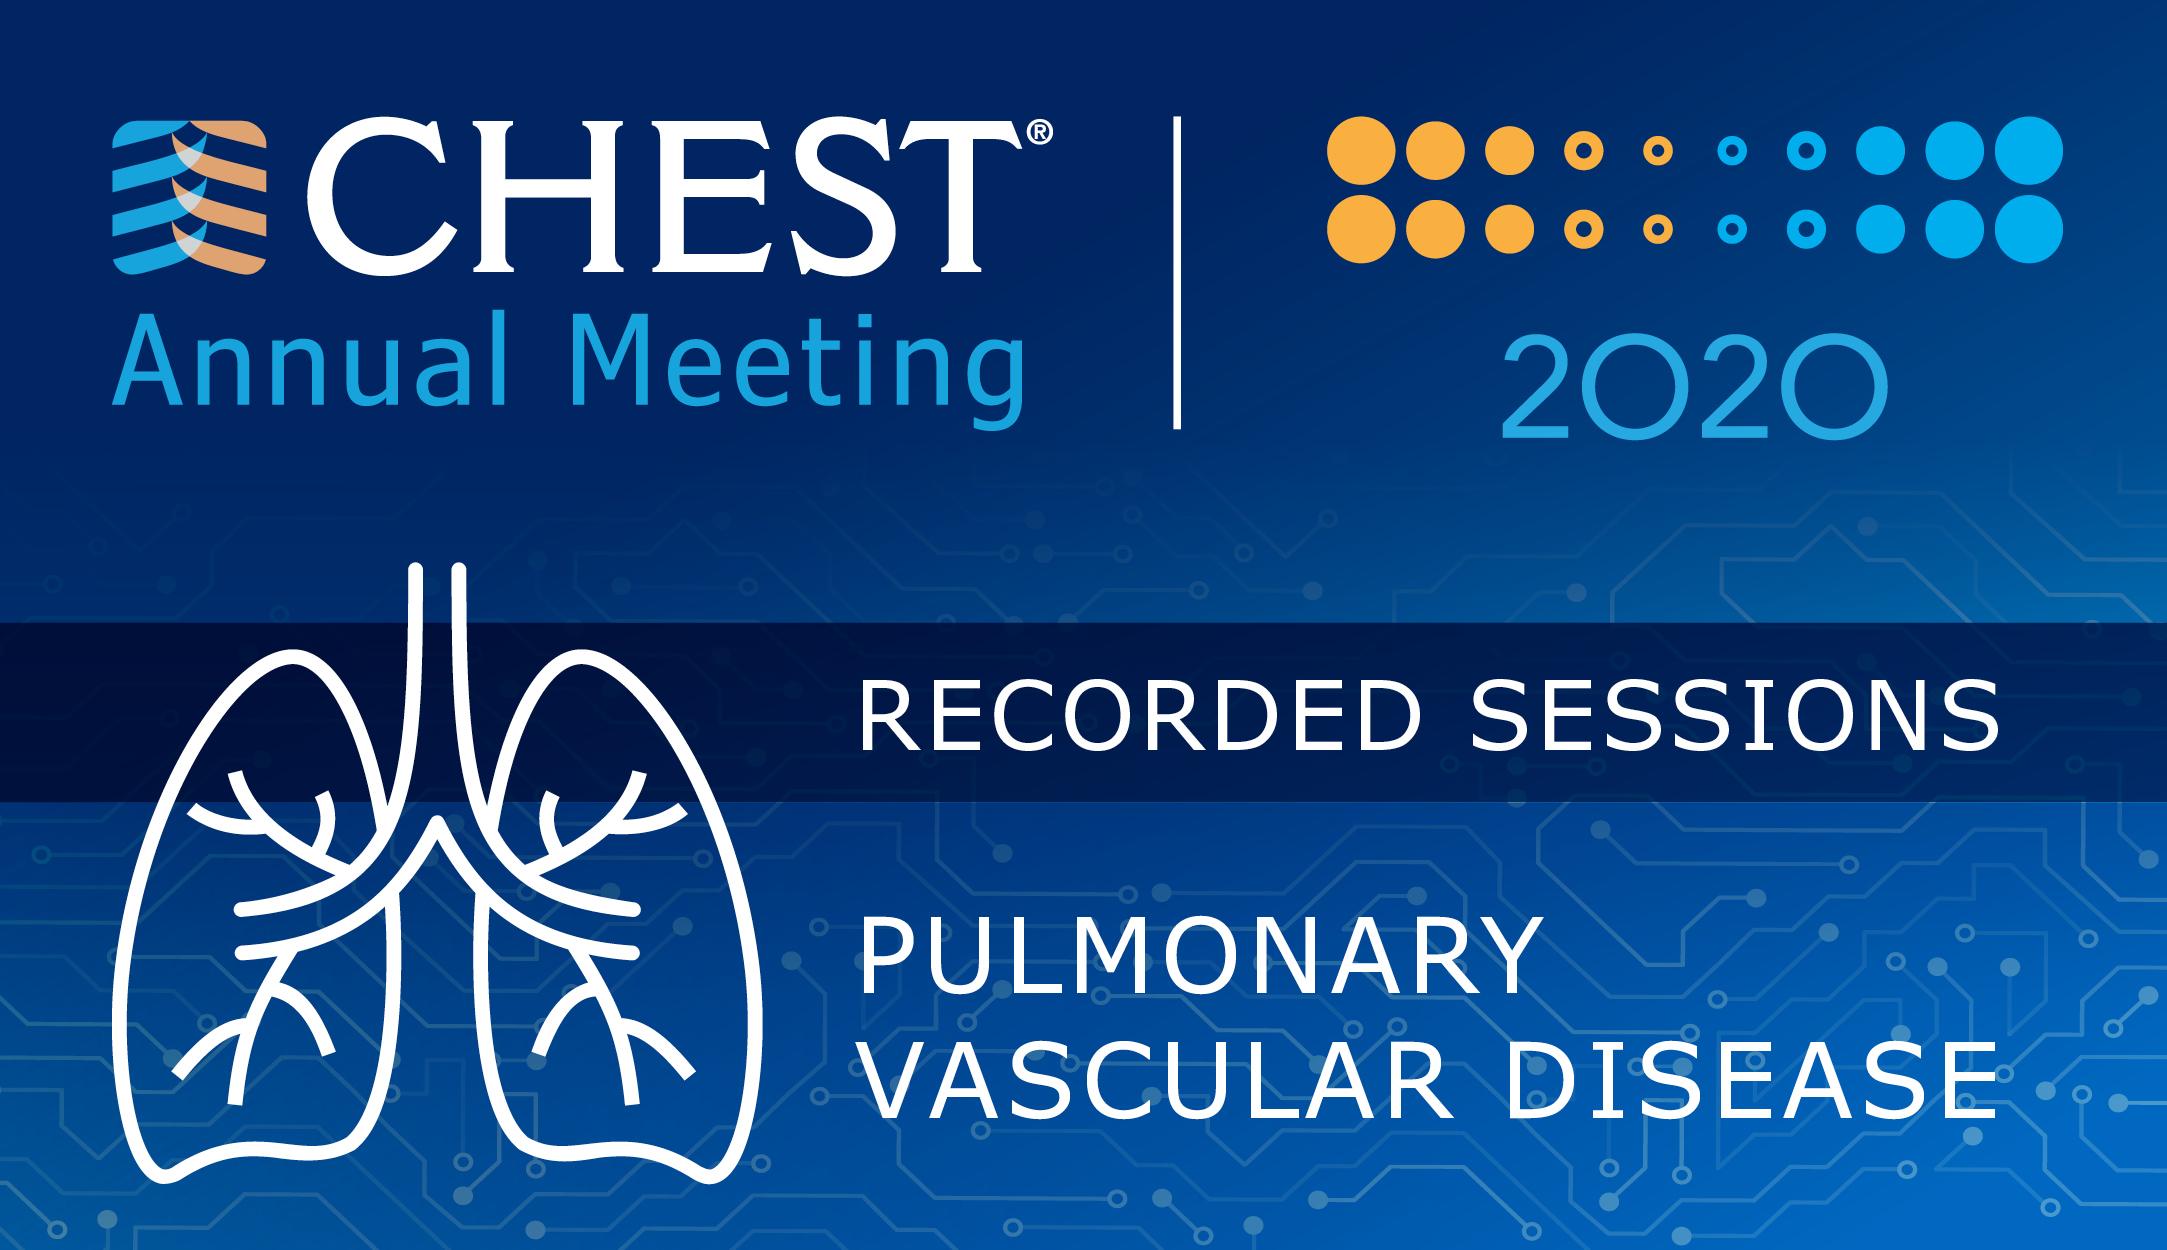 Pulmonary Vascular image